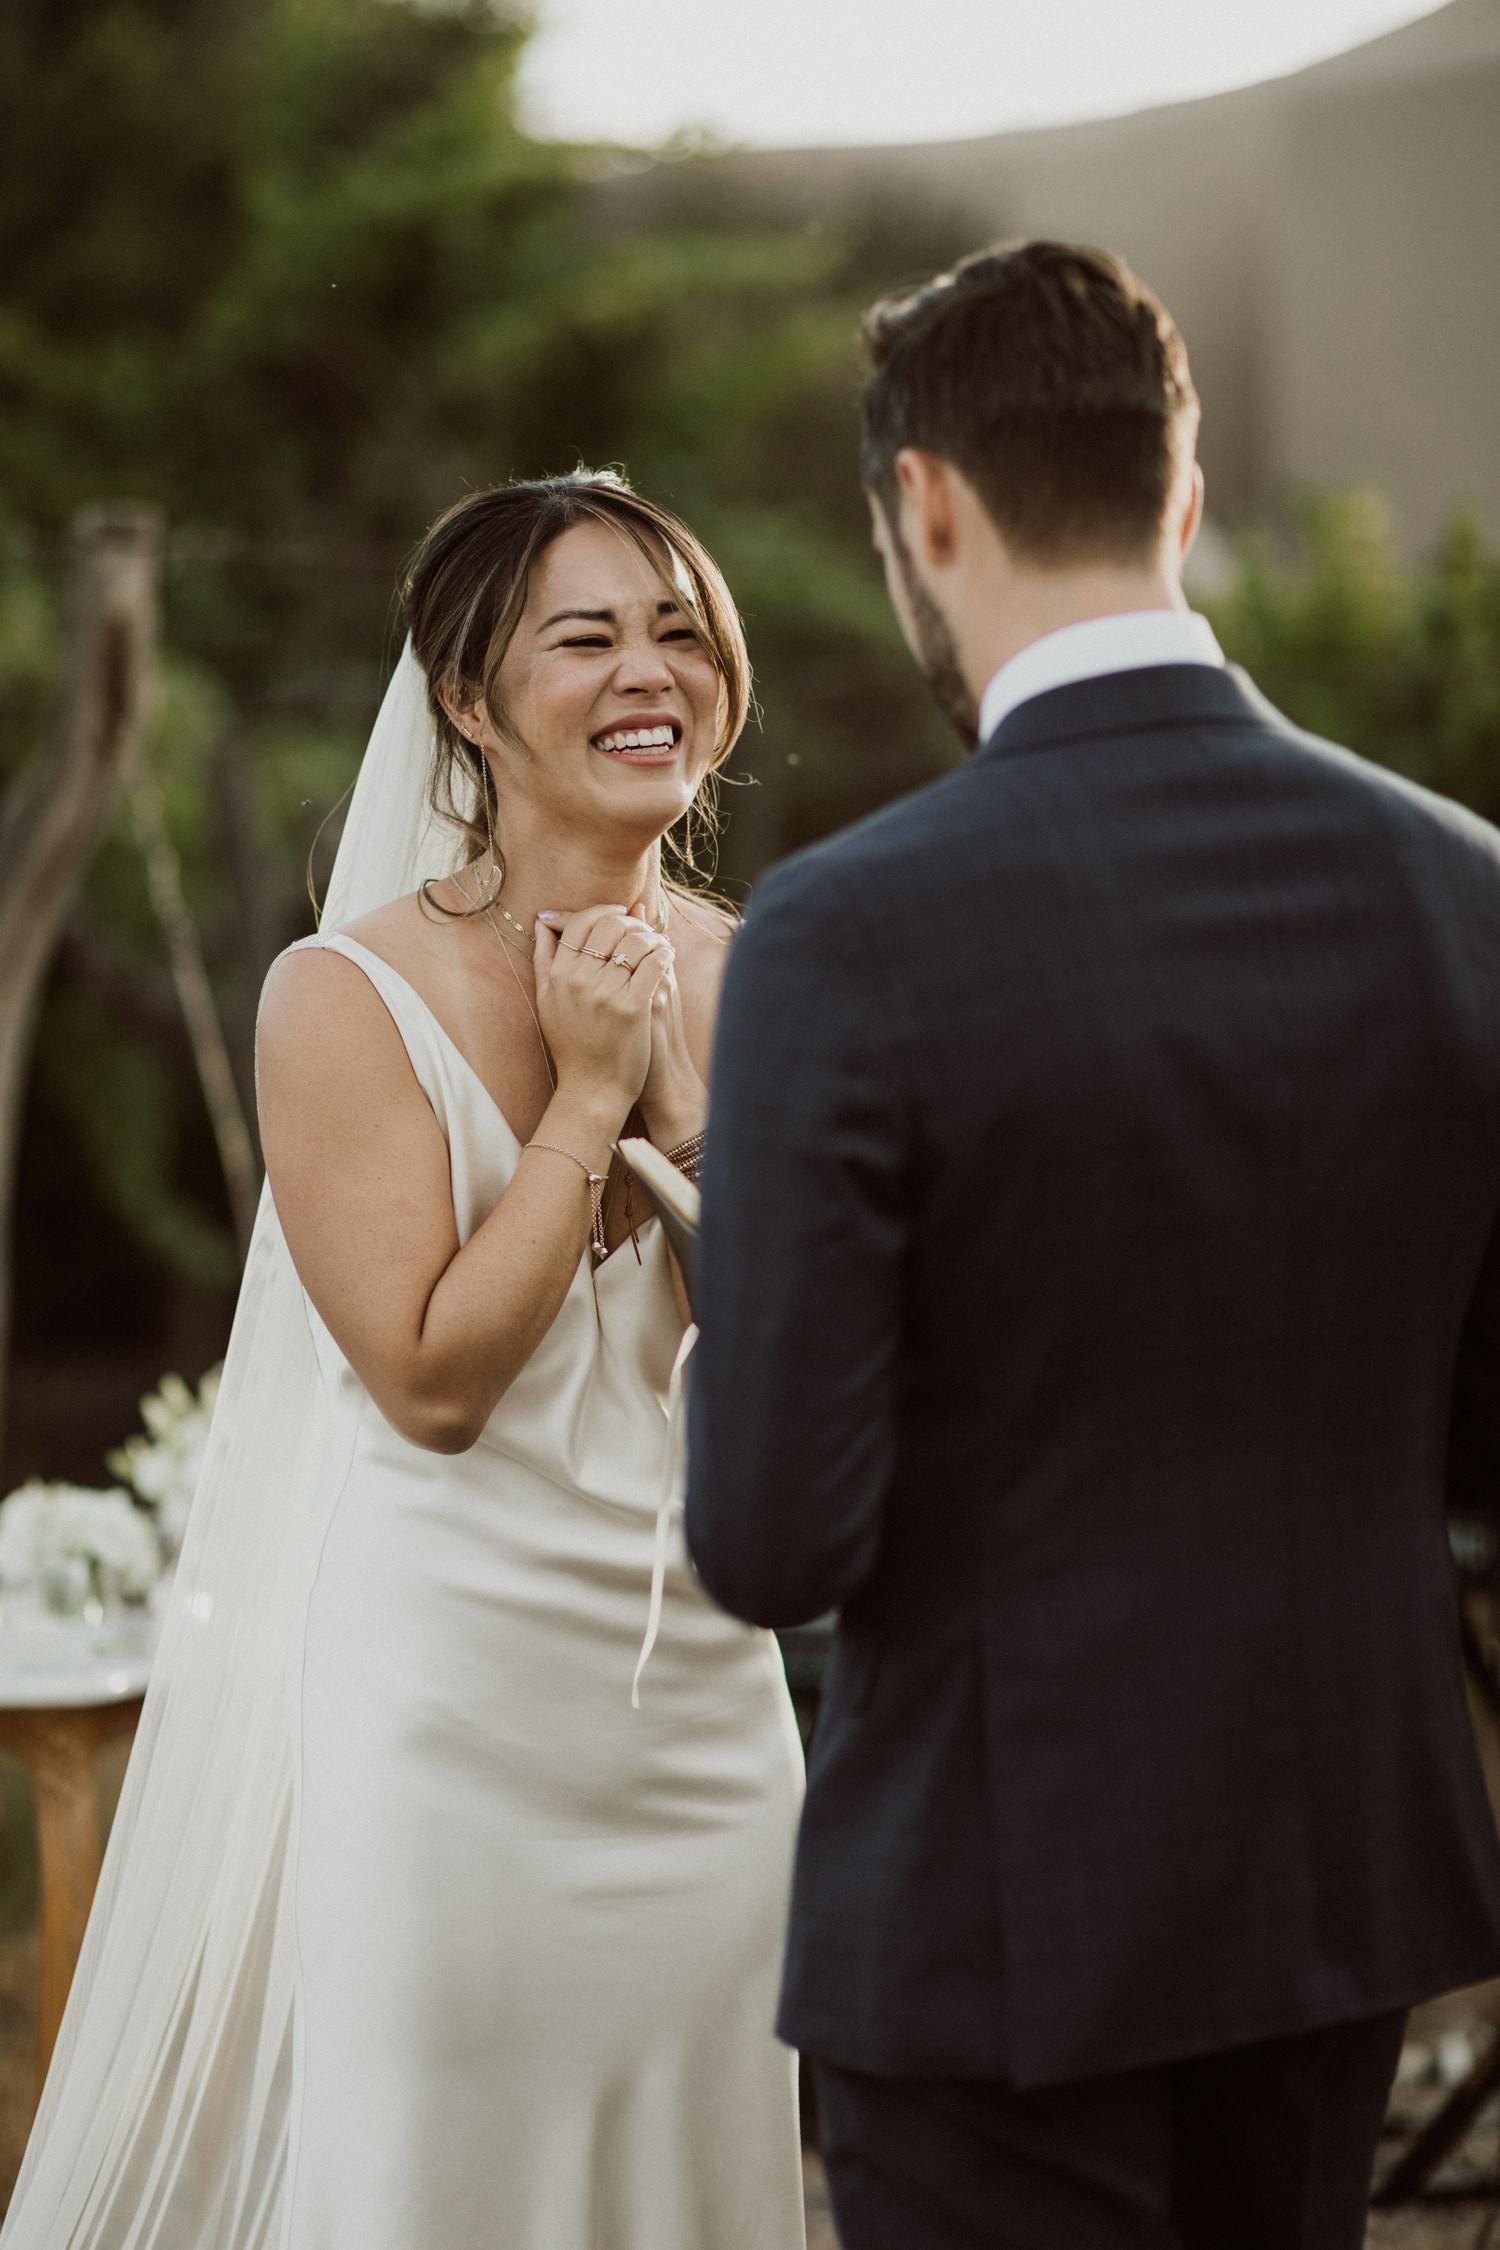 cedarandpines-kasey-erich-wedding-22.jpg